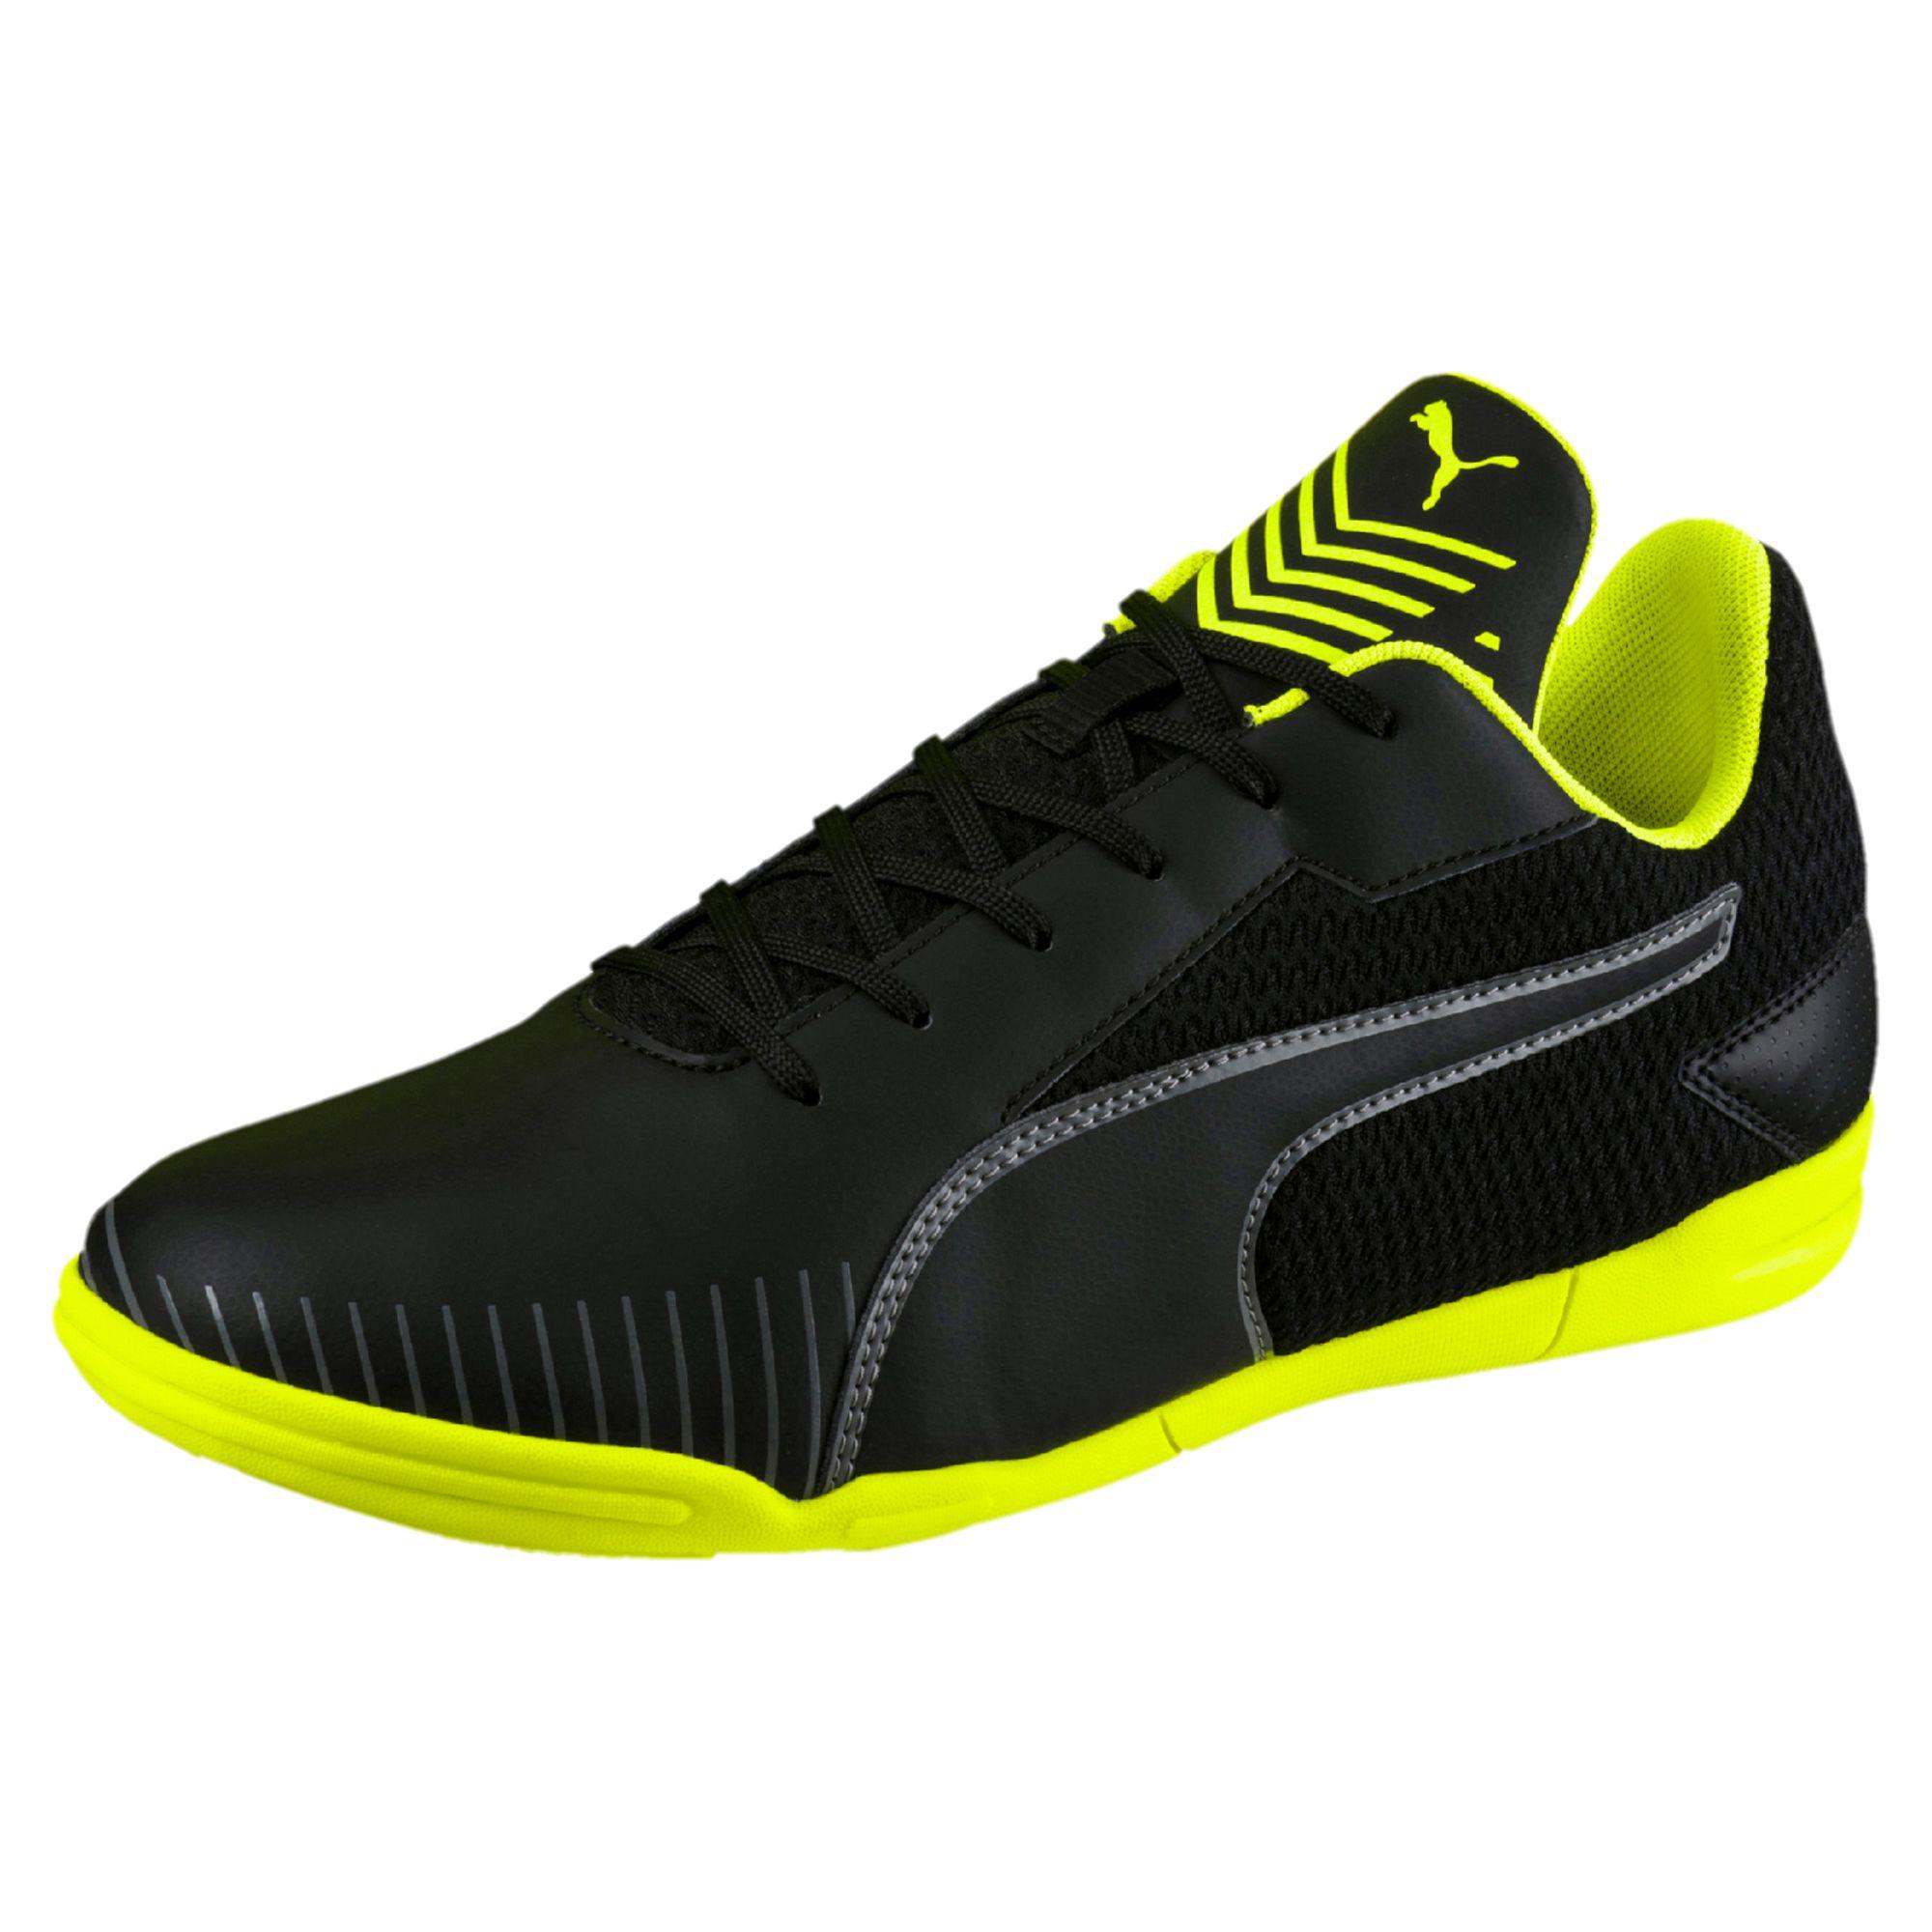 365 CT Court мужские кроссовки